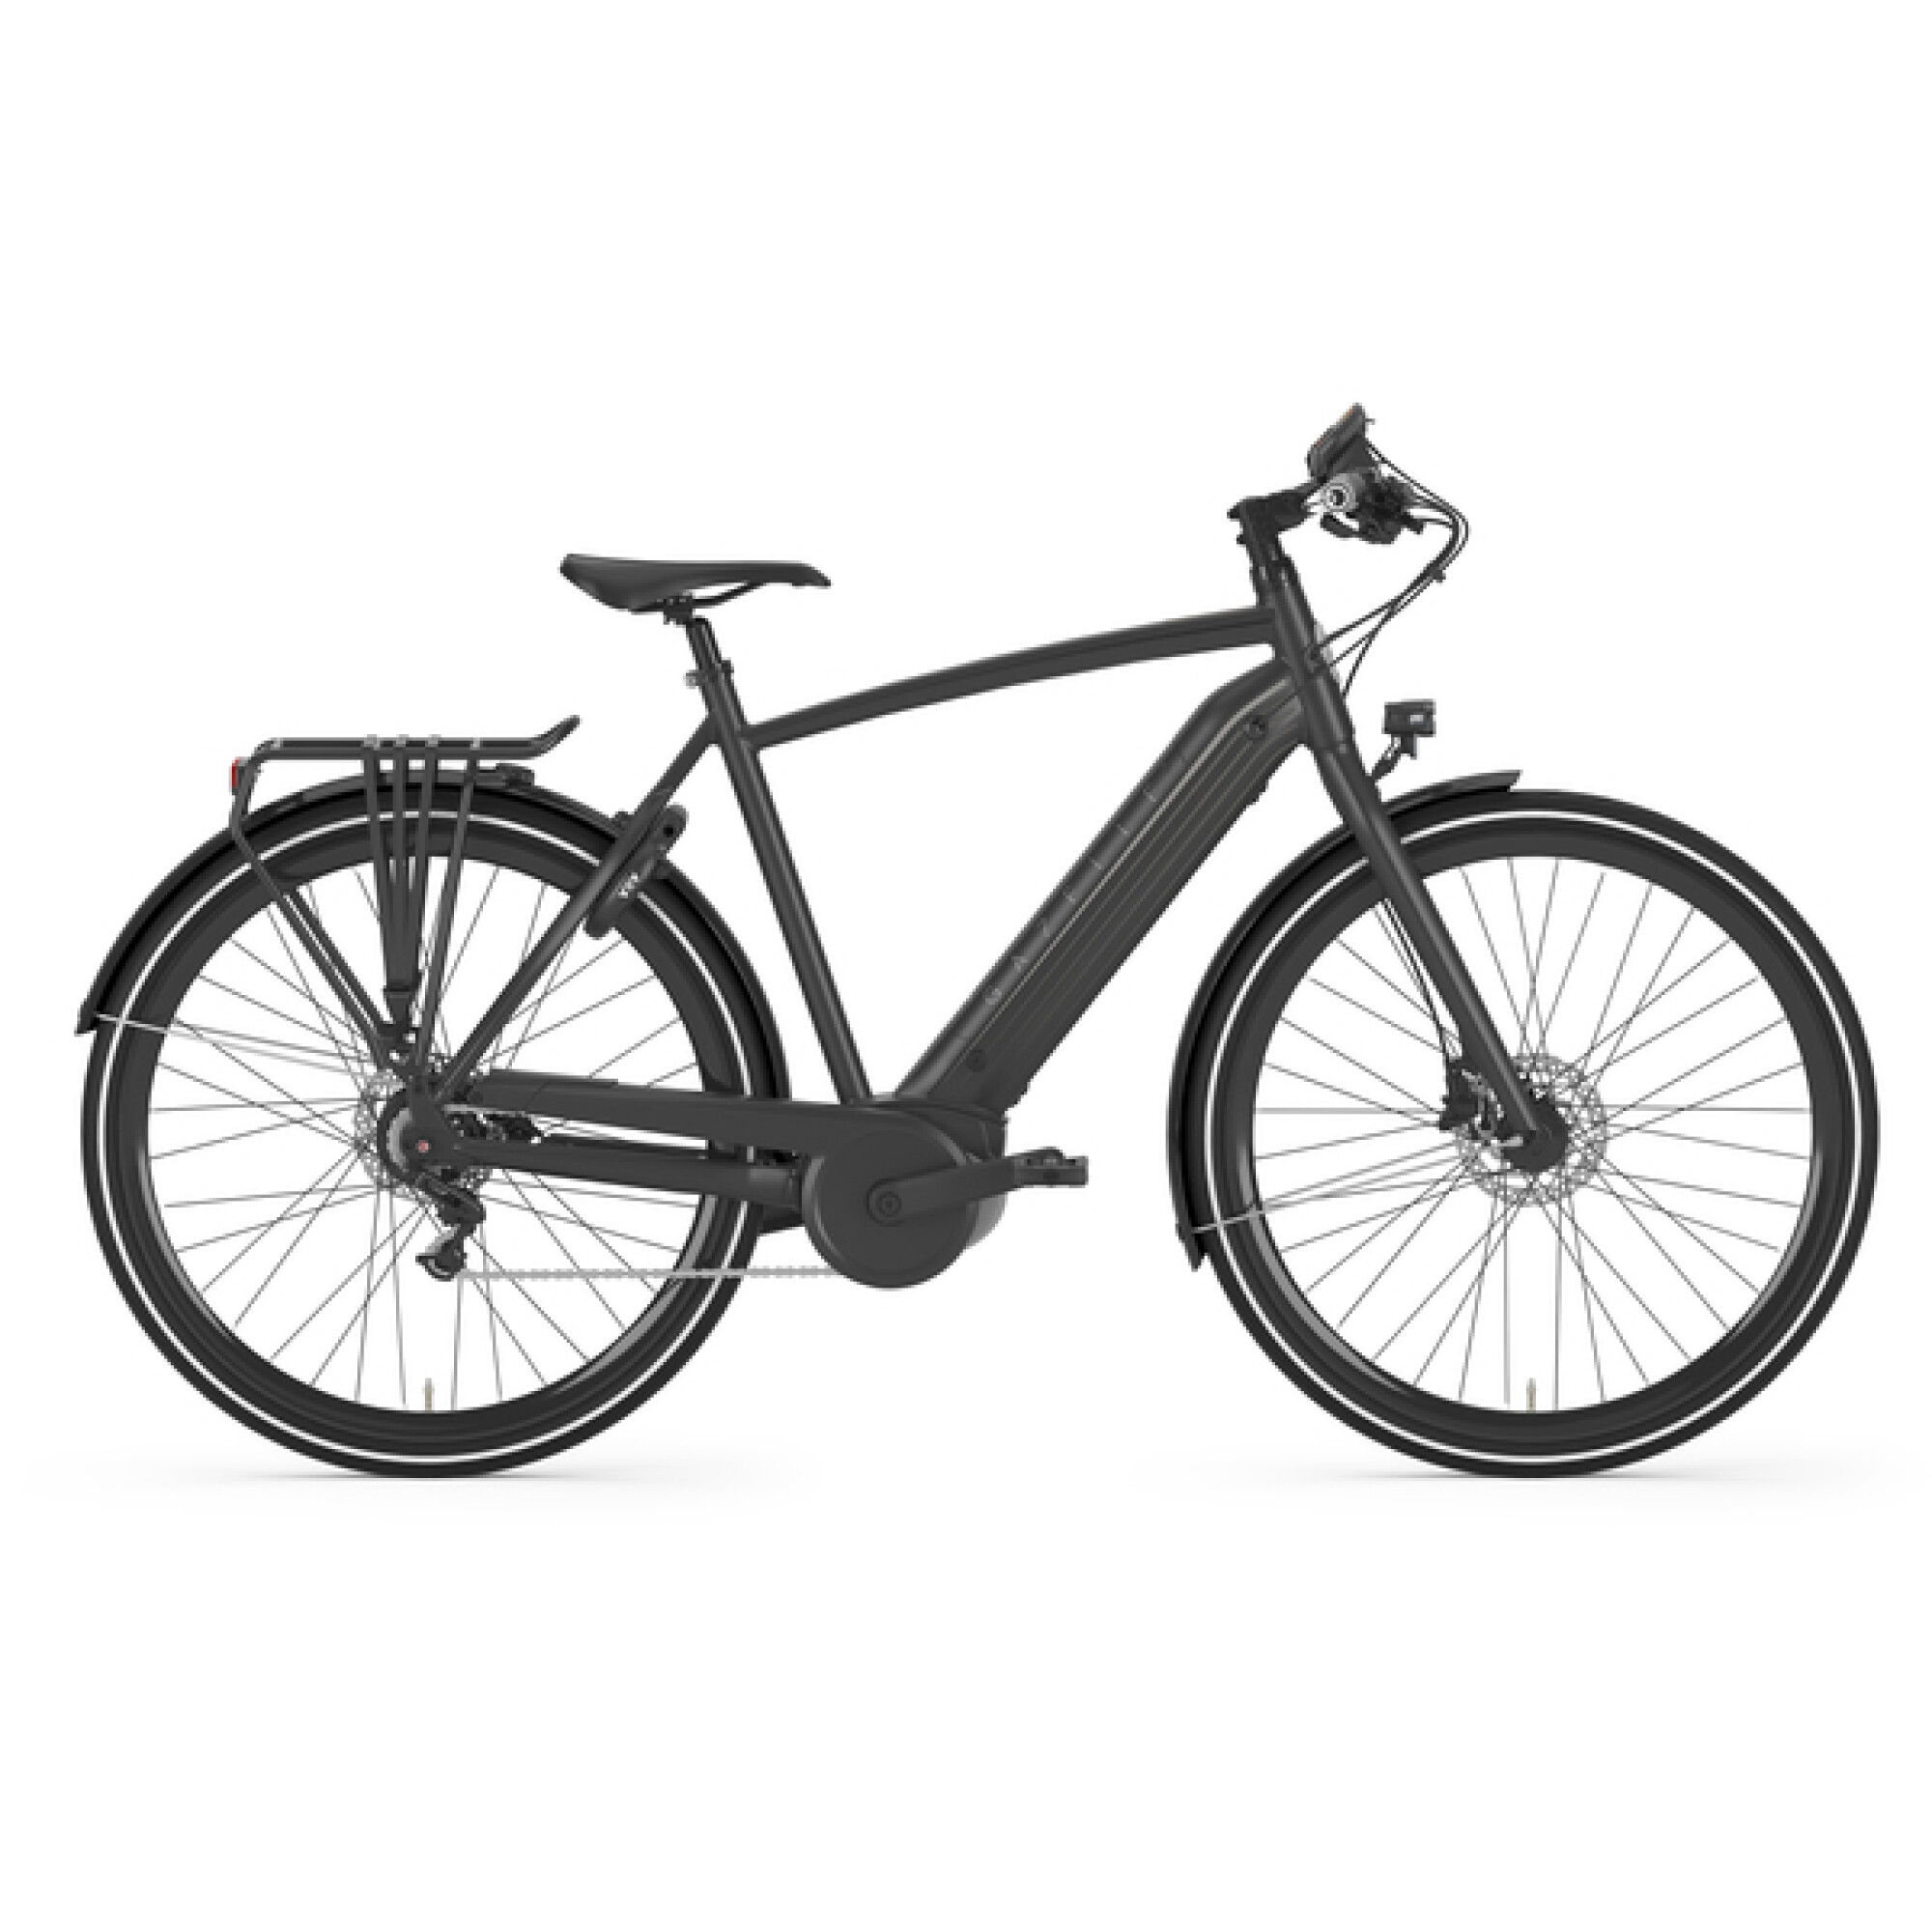 e bike gazelle cityzen c8 hmb 2018 bei alle. Black Bedroom Furniture Sets. Home Design Ideas